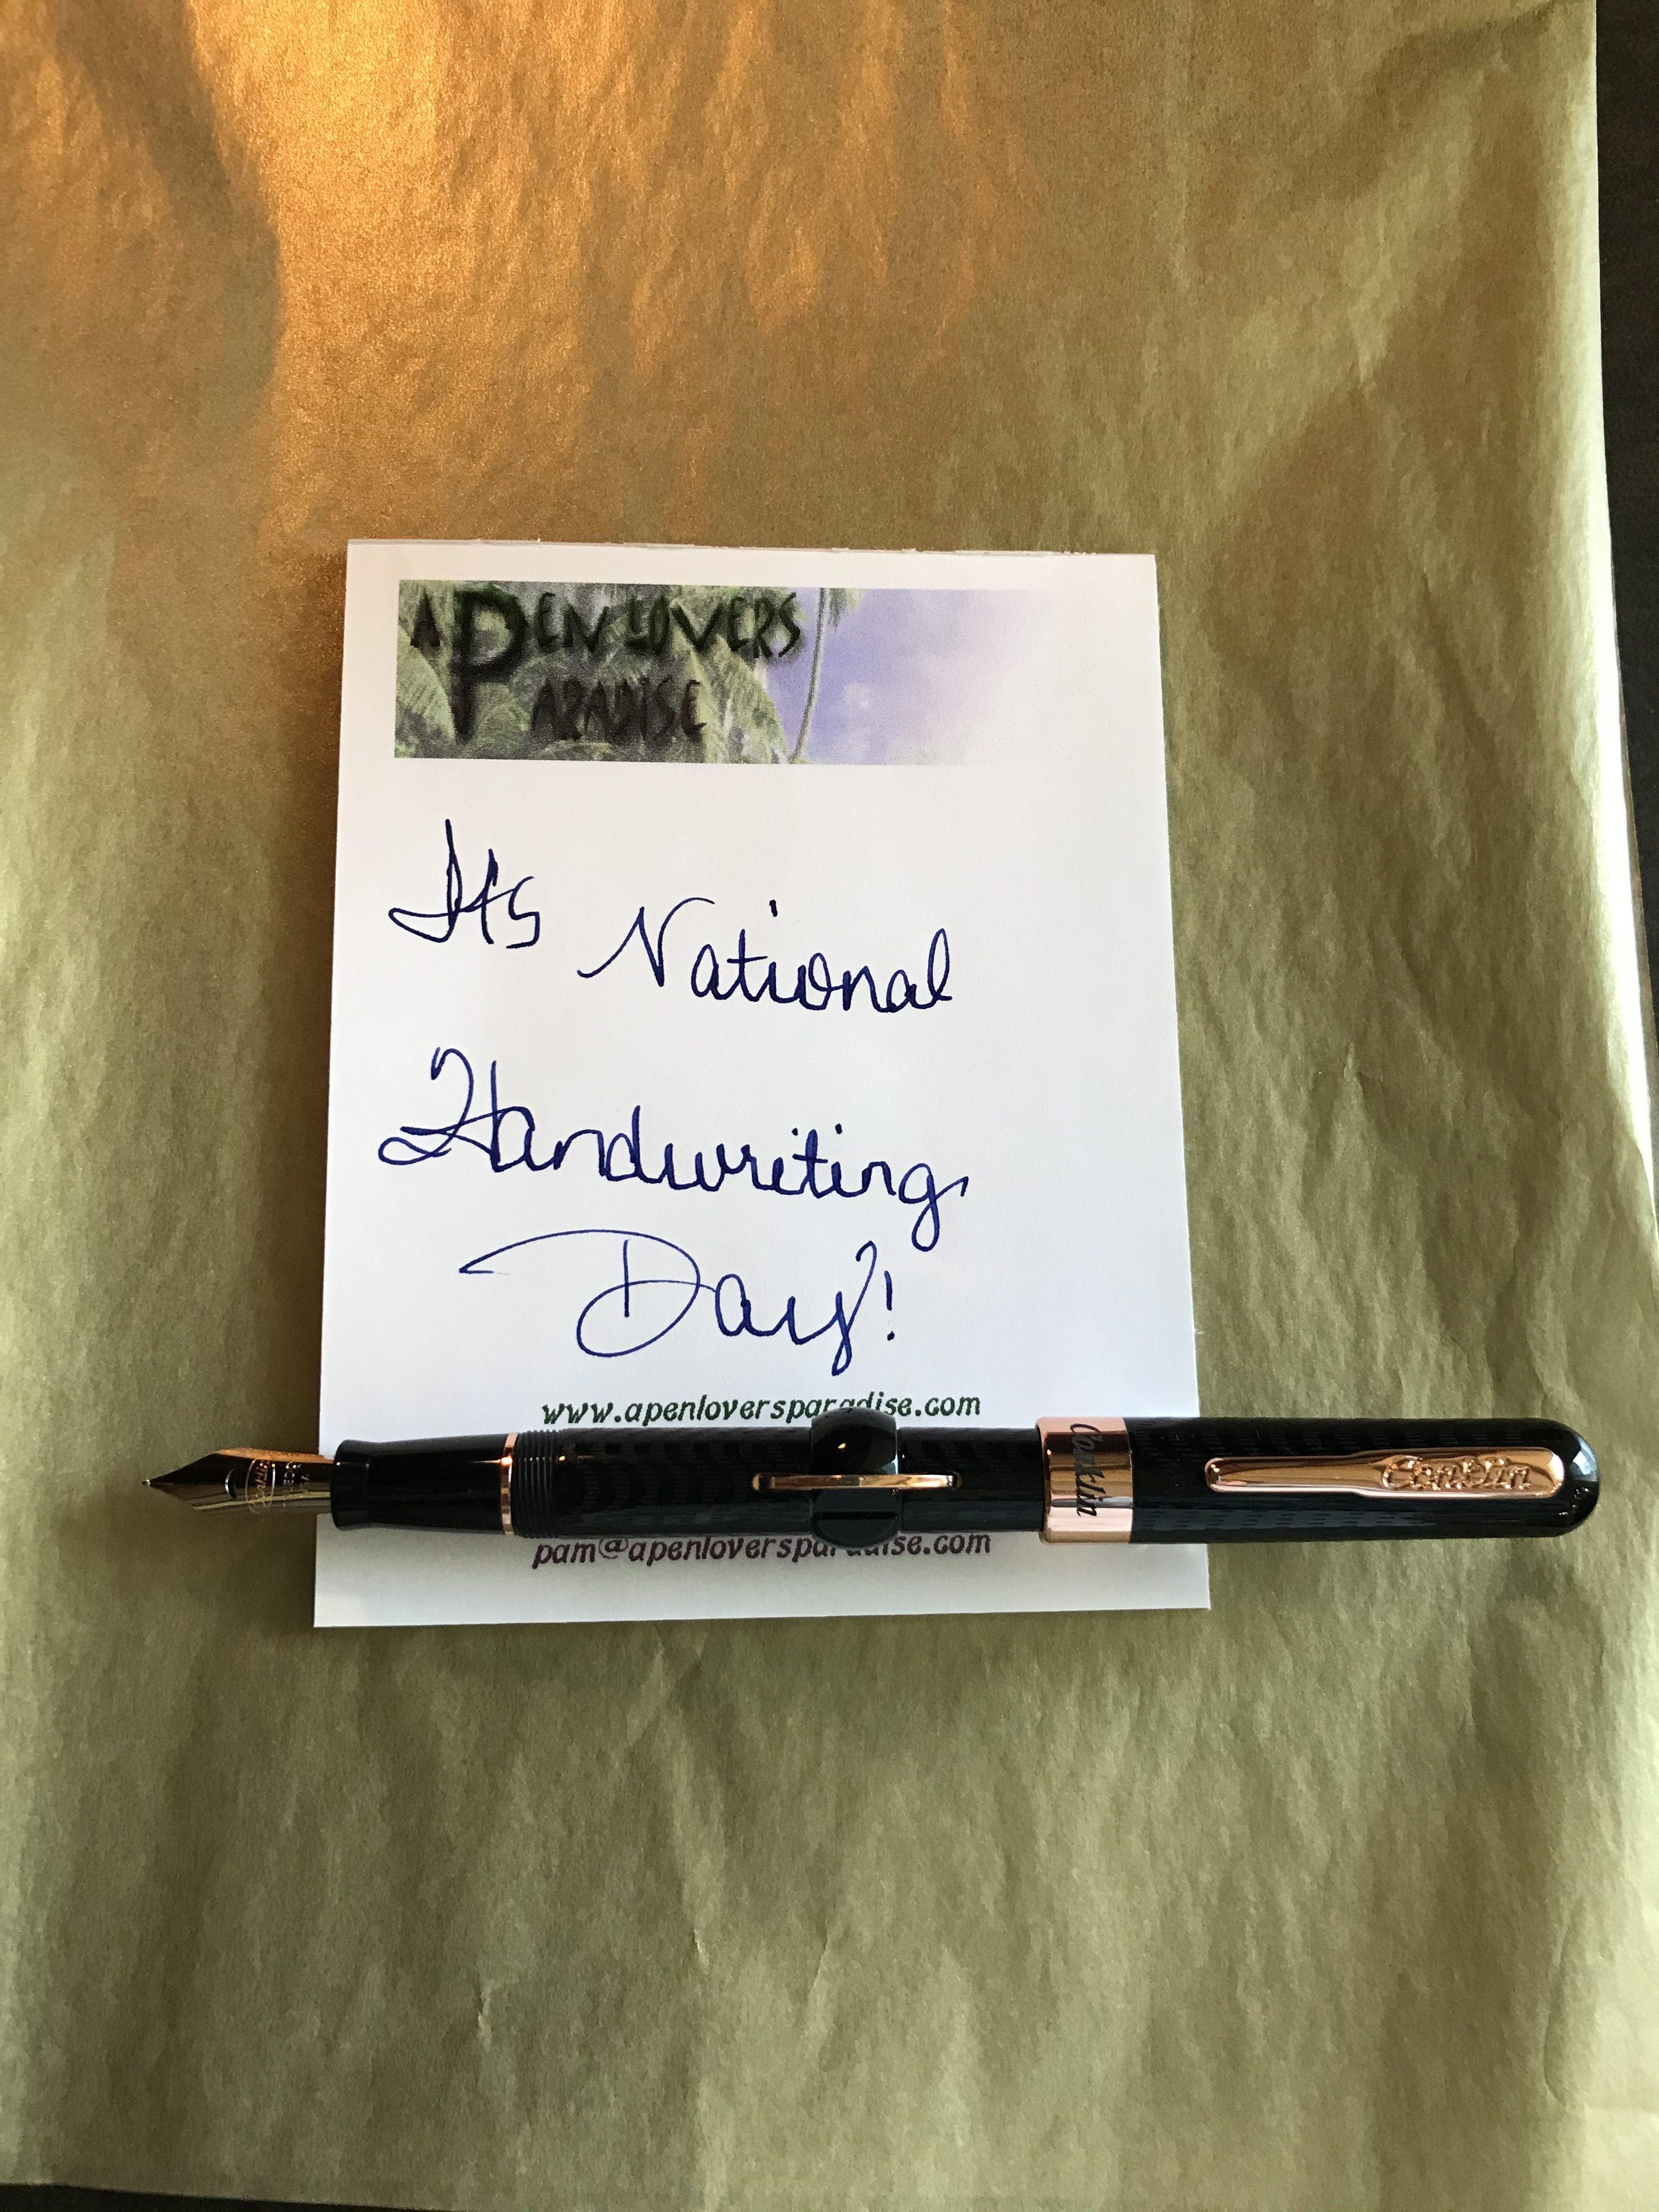 NATIONAL HANDWRITING DAY